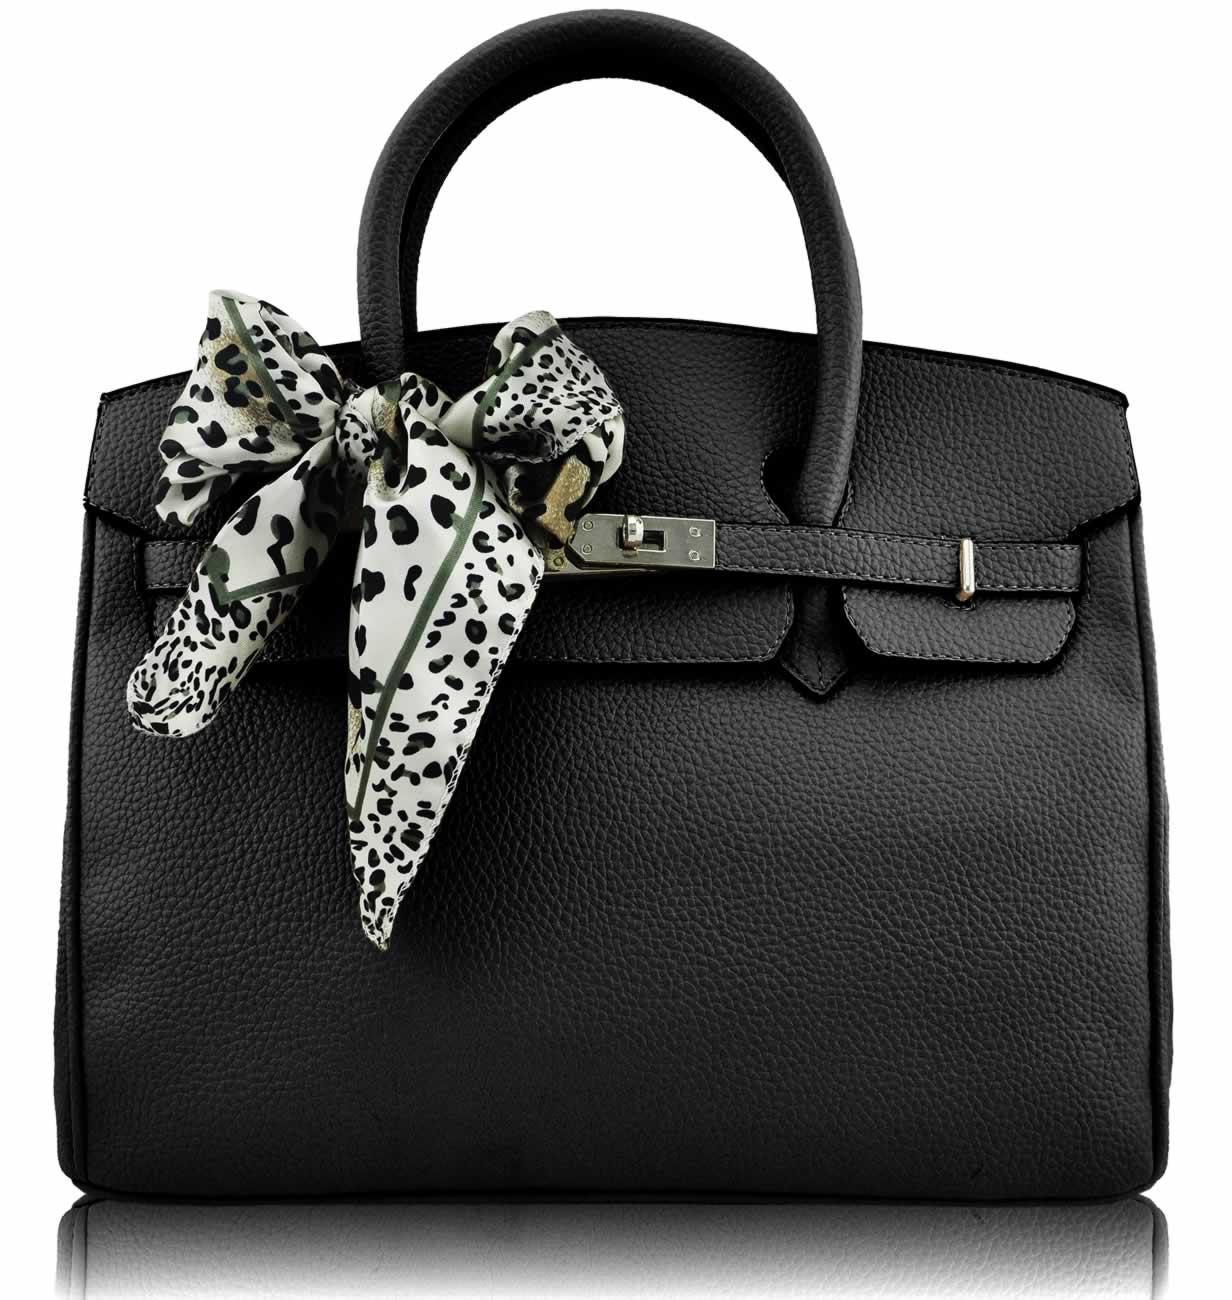 wholesale black fashion scarf tote handbag